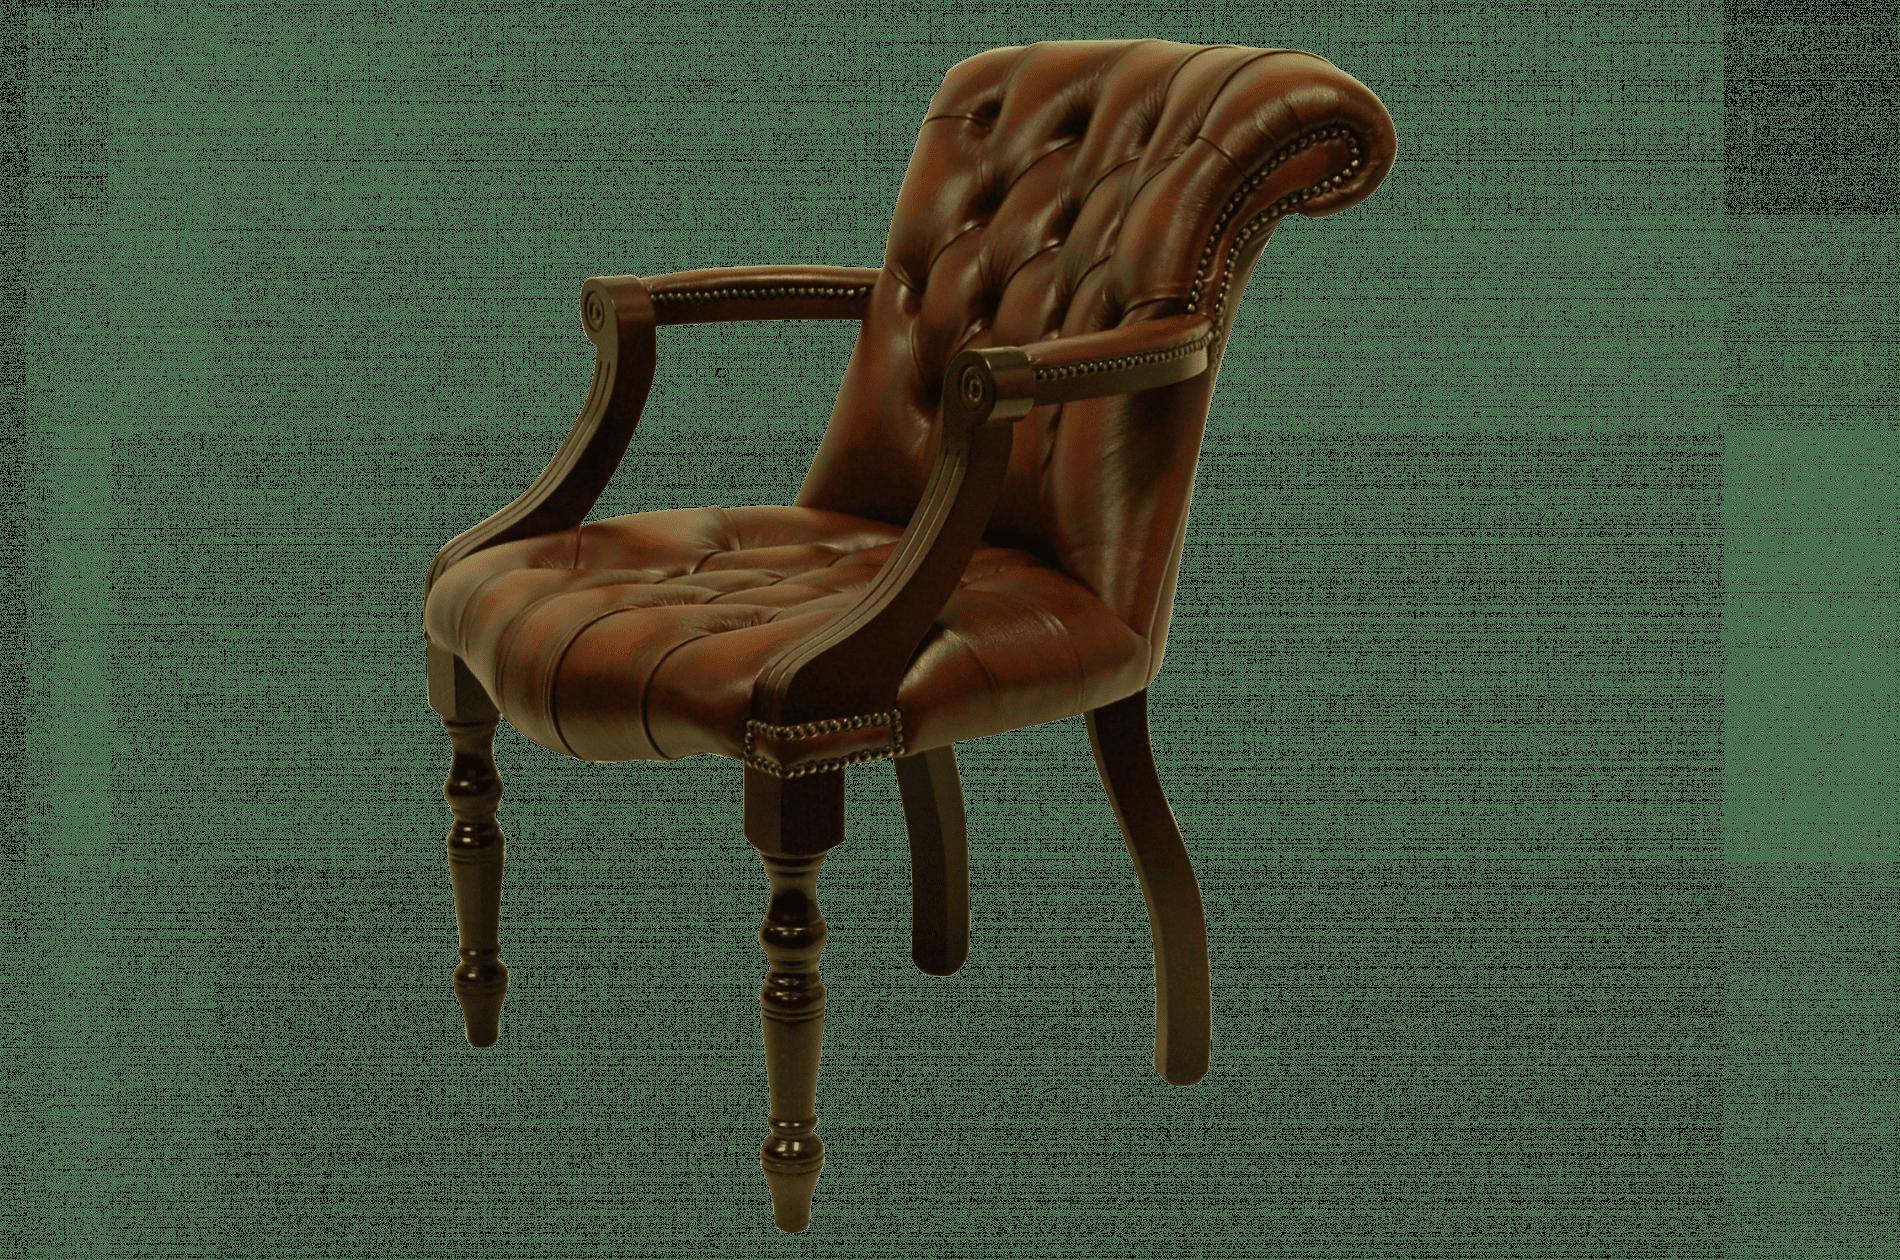 delta-chesterfield-admiral-stand-chair-light-rust-bureaustoel-zijaanzicht-links